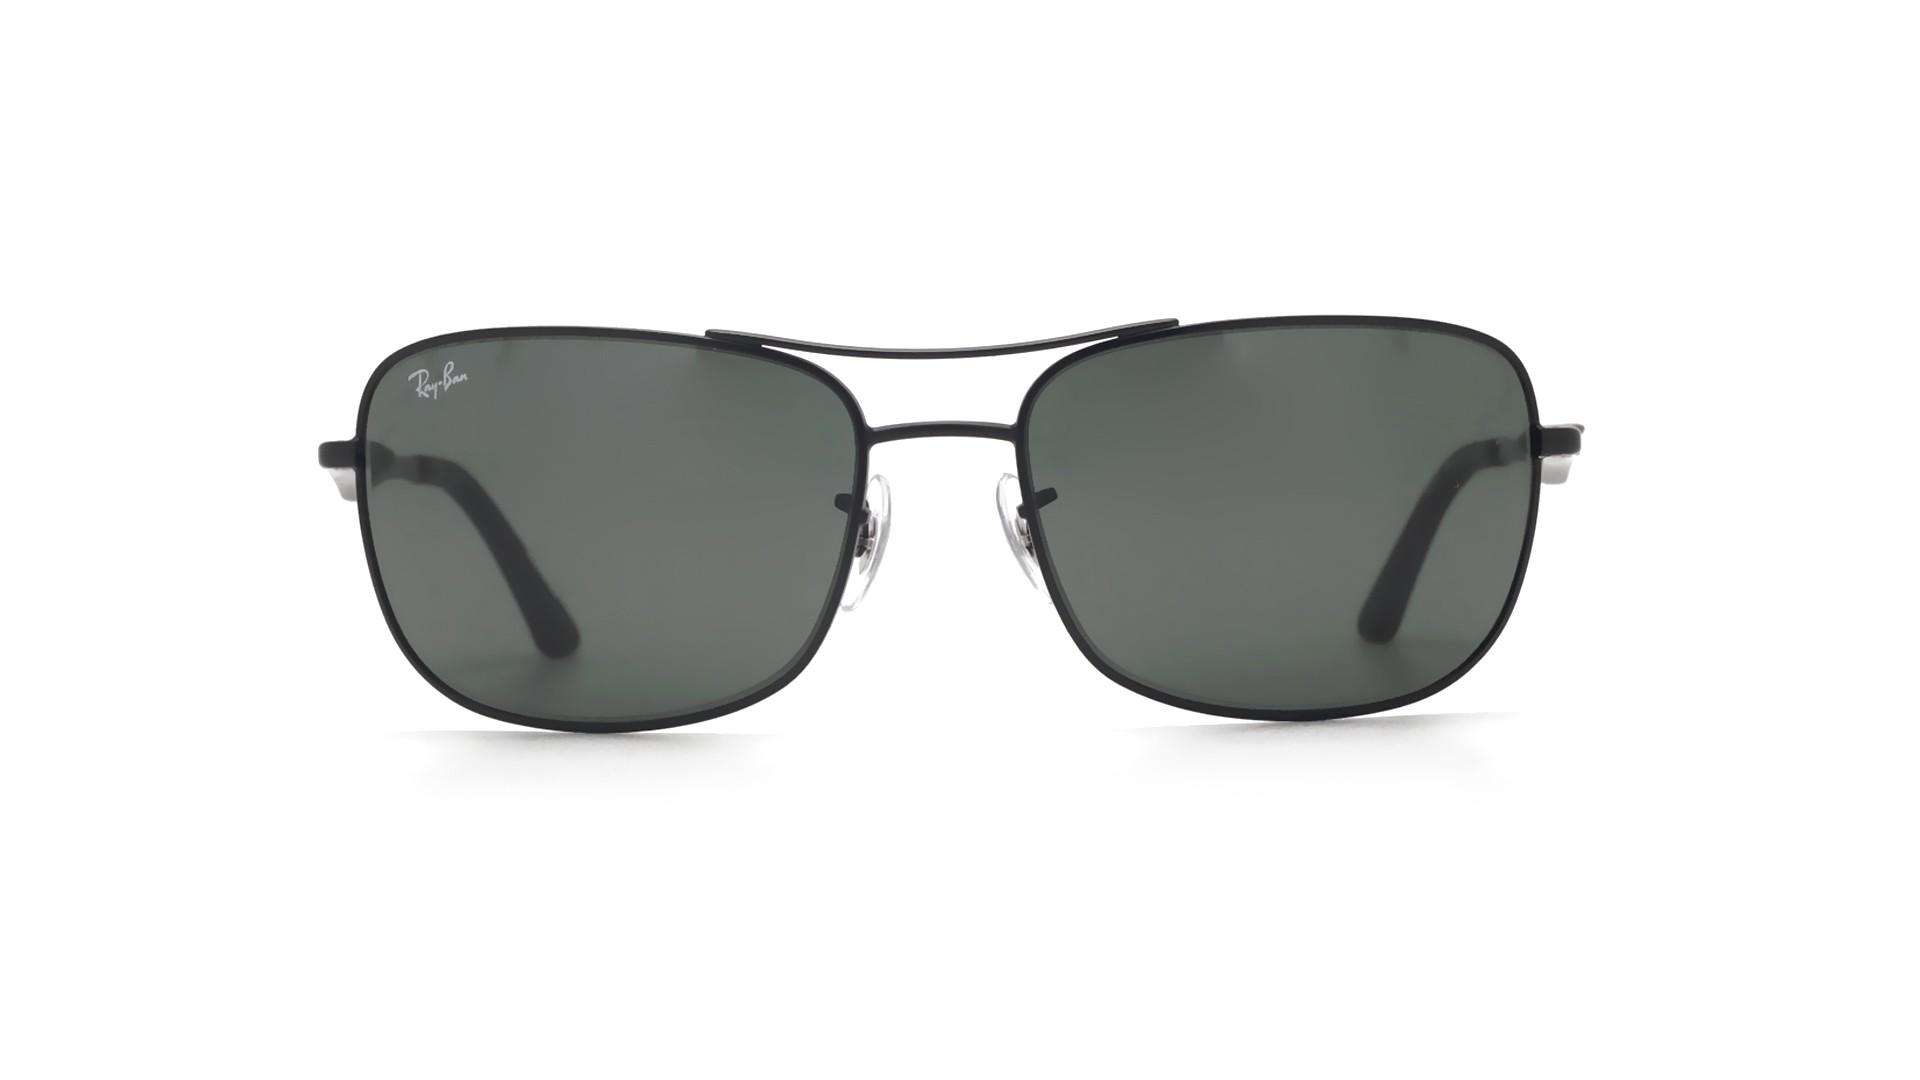 9e747ebf4b687 Sunglasses Ray-Ban RB3515 006 71 61-17 Black Matte Large